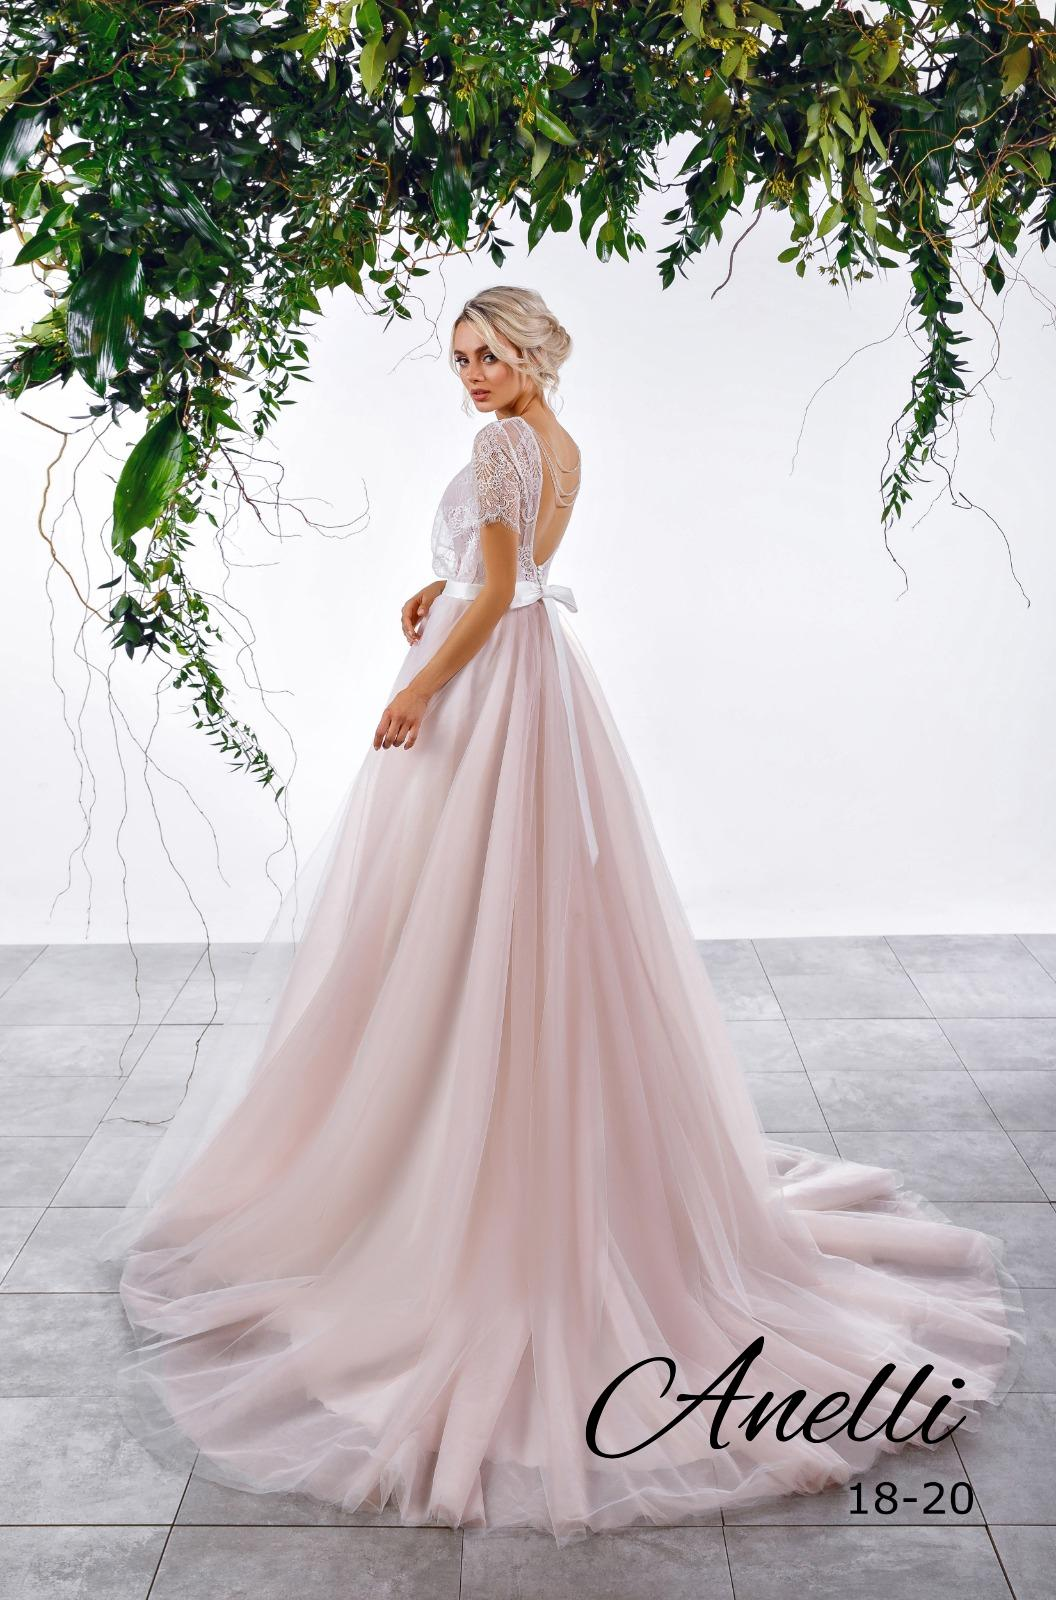 Svadobné šaty - Floral 1820 - Obrázok č. 3